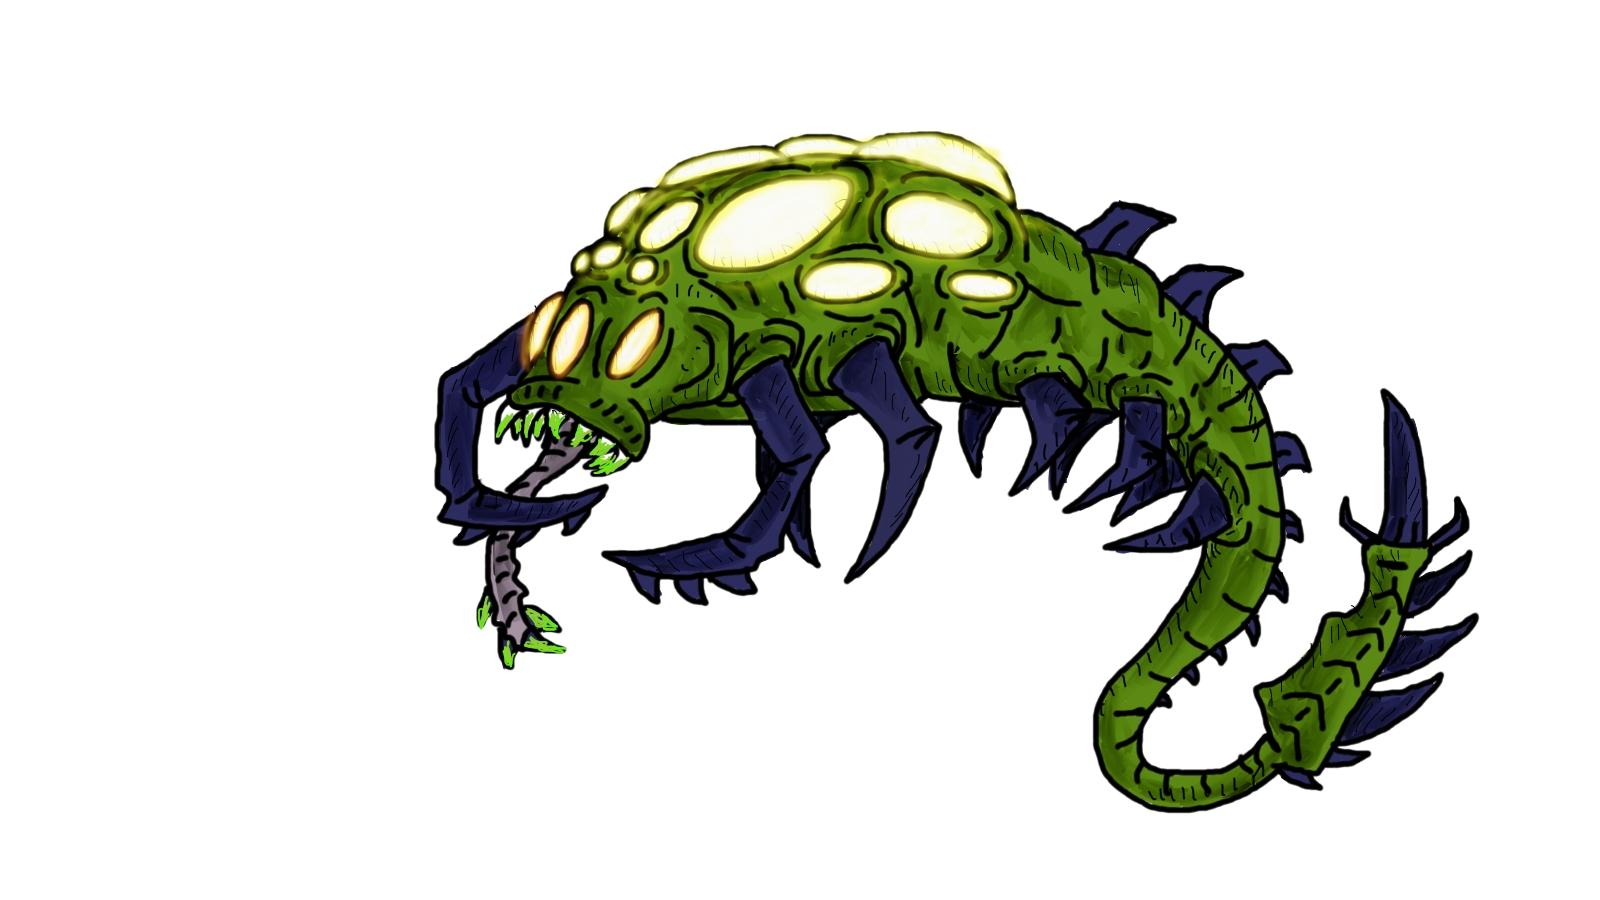 Parasitic Alien Virus by corex13